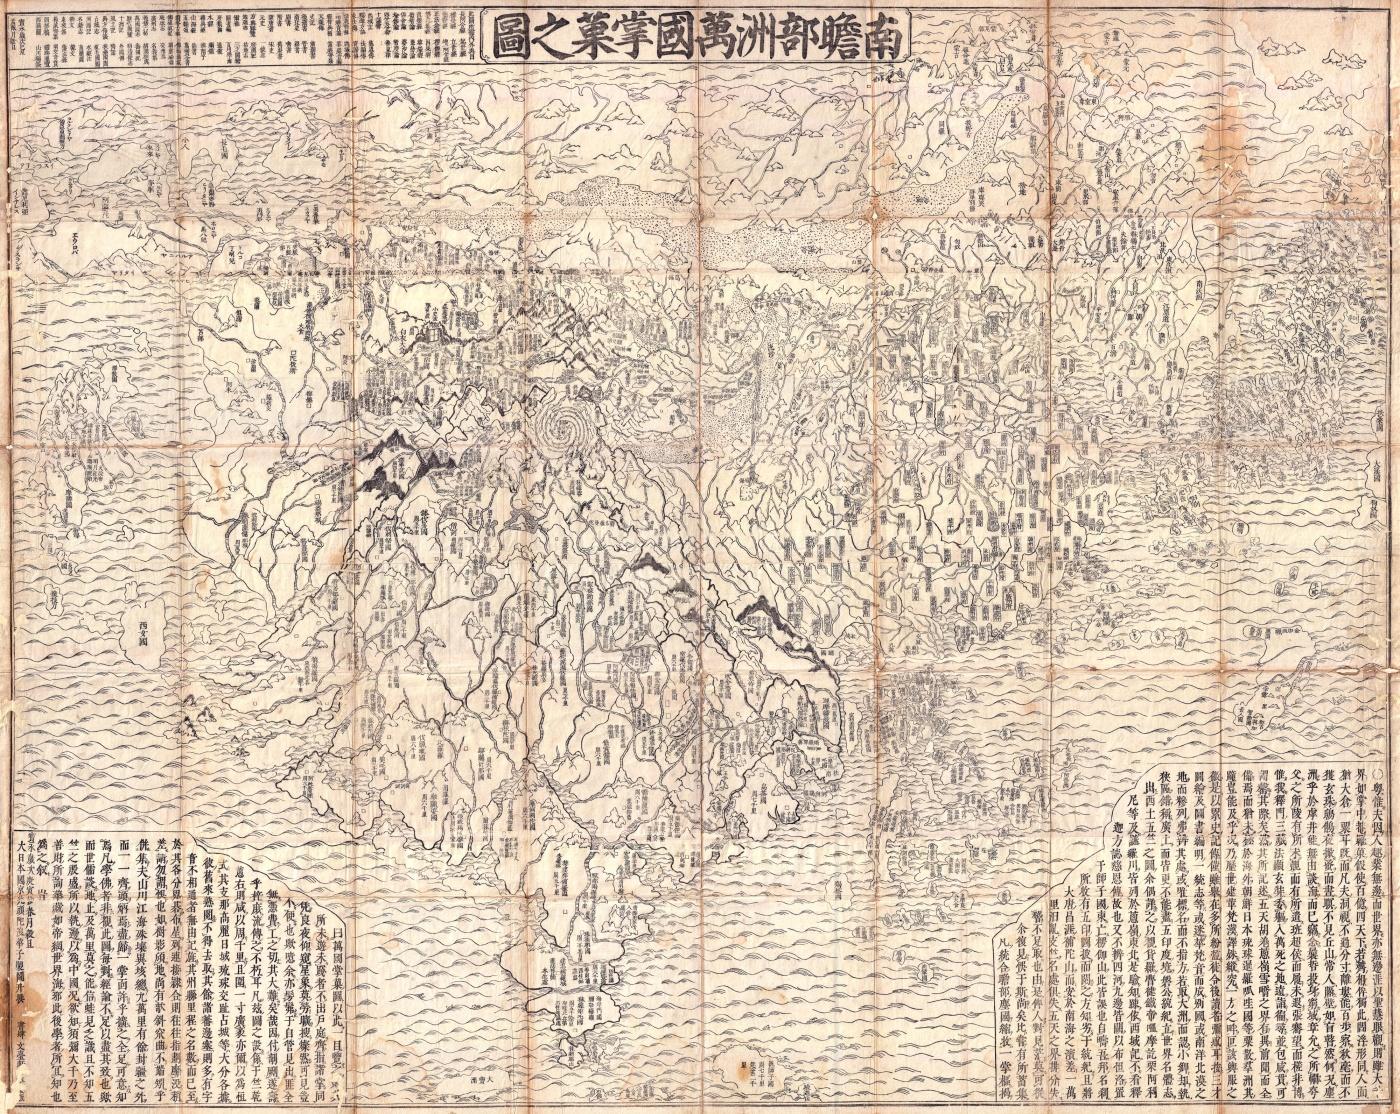 First Japanese Buddhist map